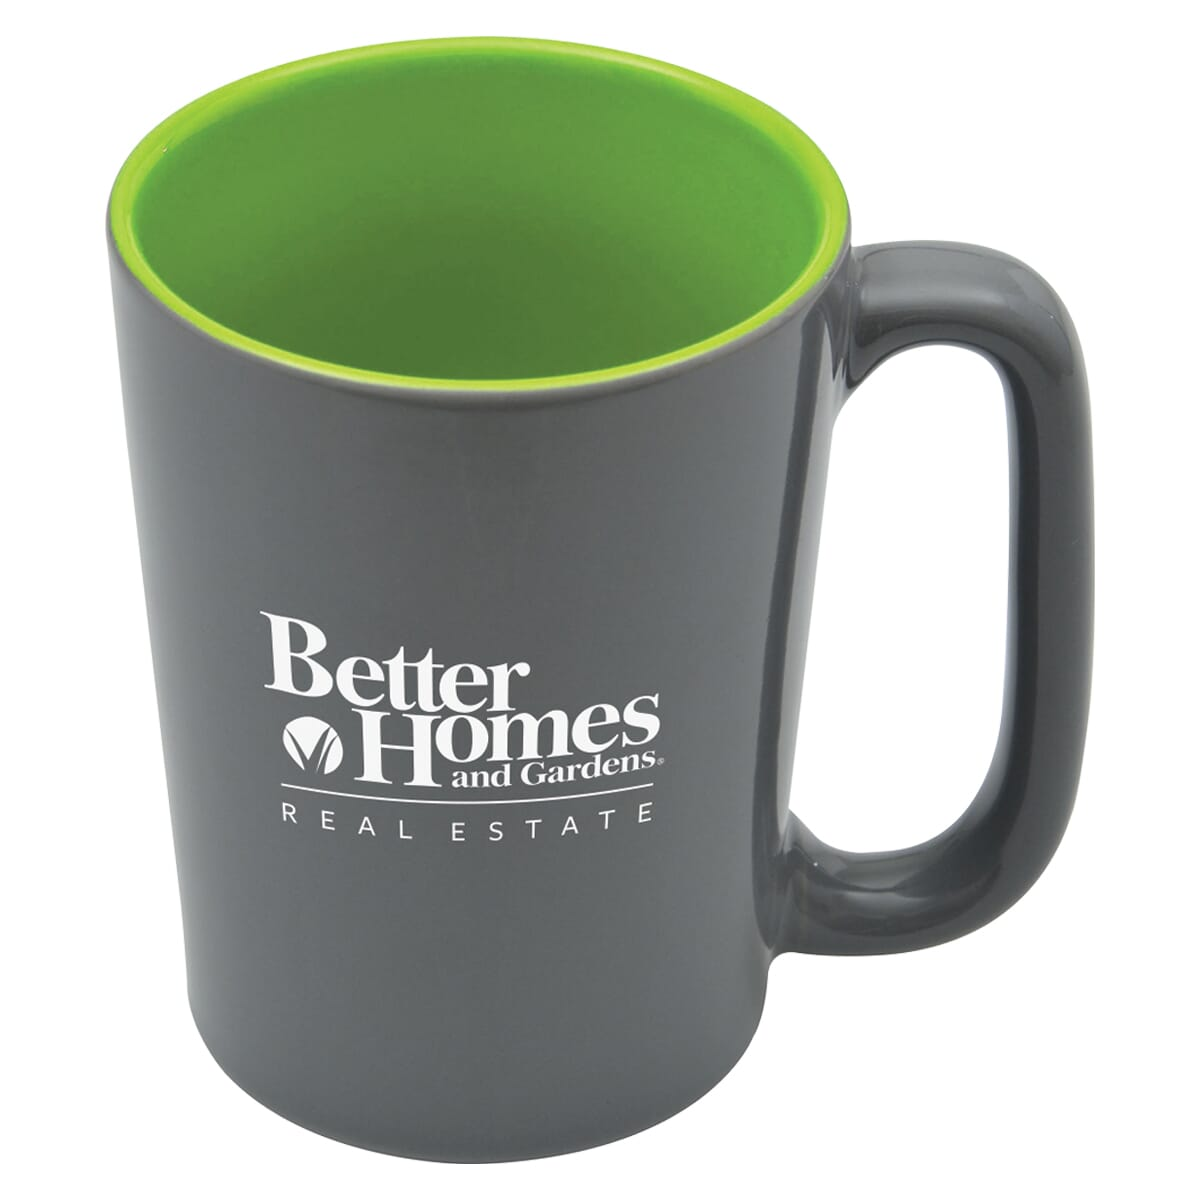 Coffee mug with colorful inside